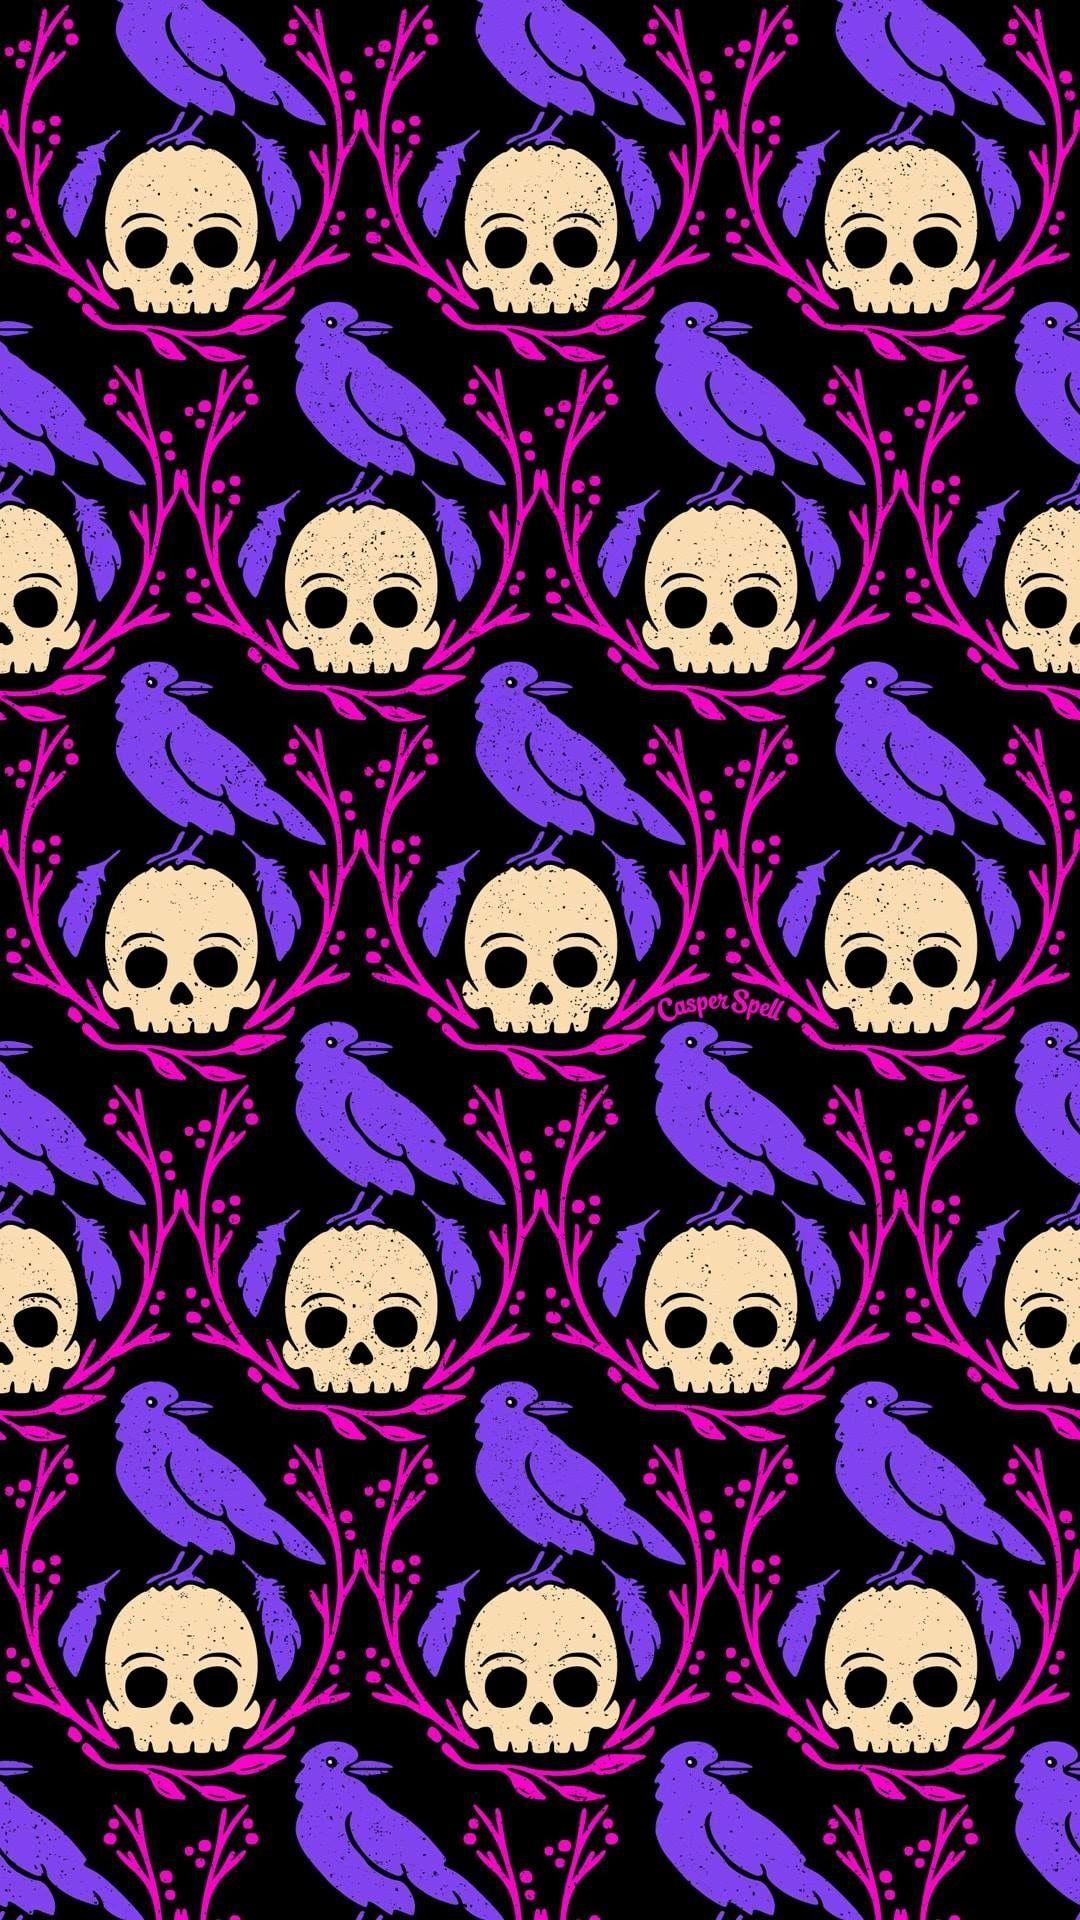 30 Halloween Wallpaper Gothic Goth Wallpaper Halloween Wallpaper Skull Wallpaper